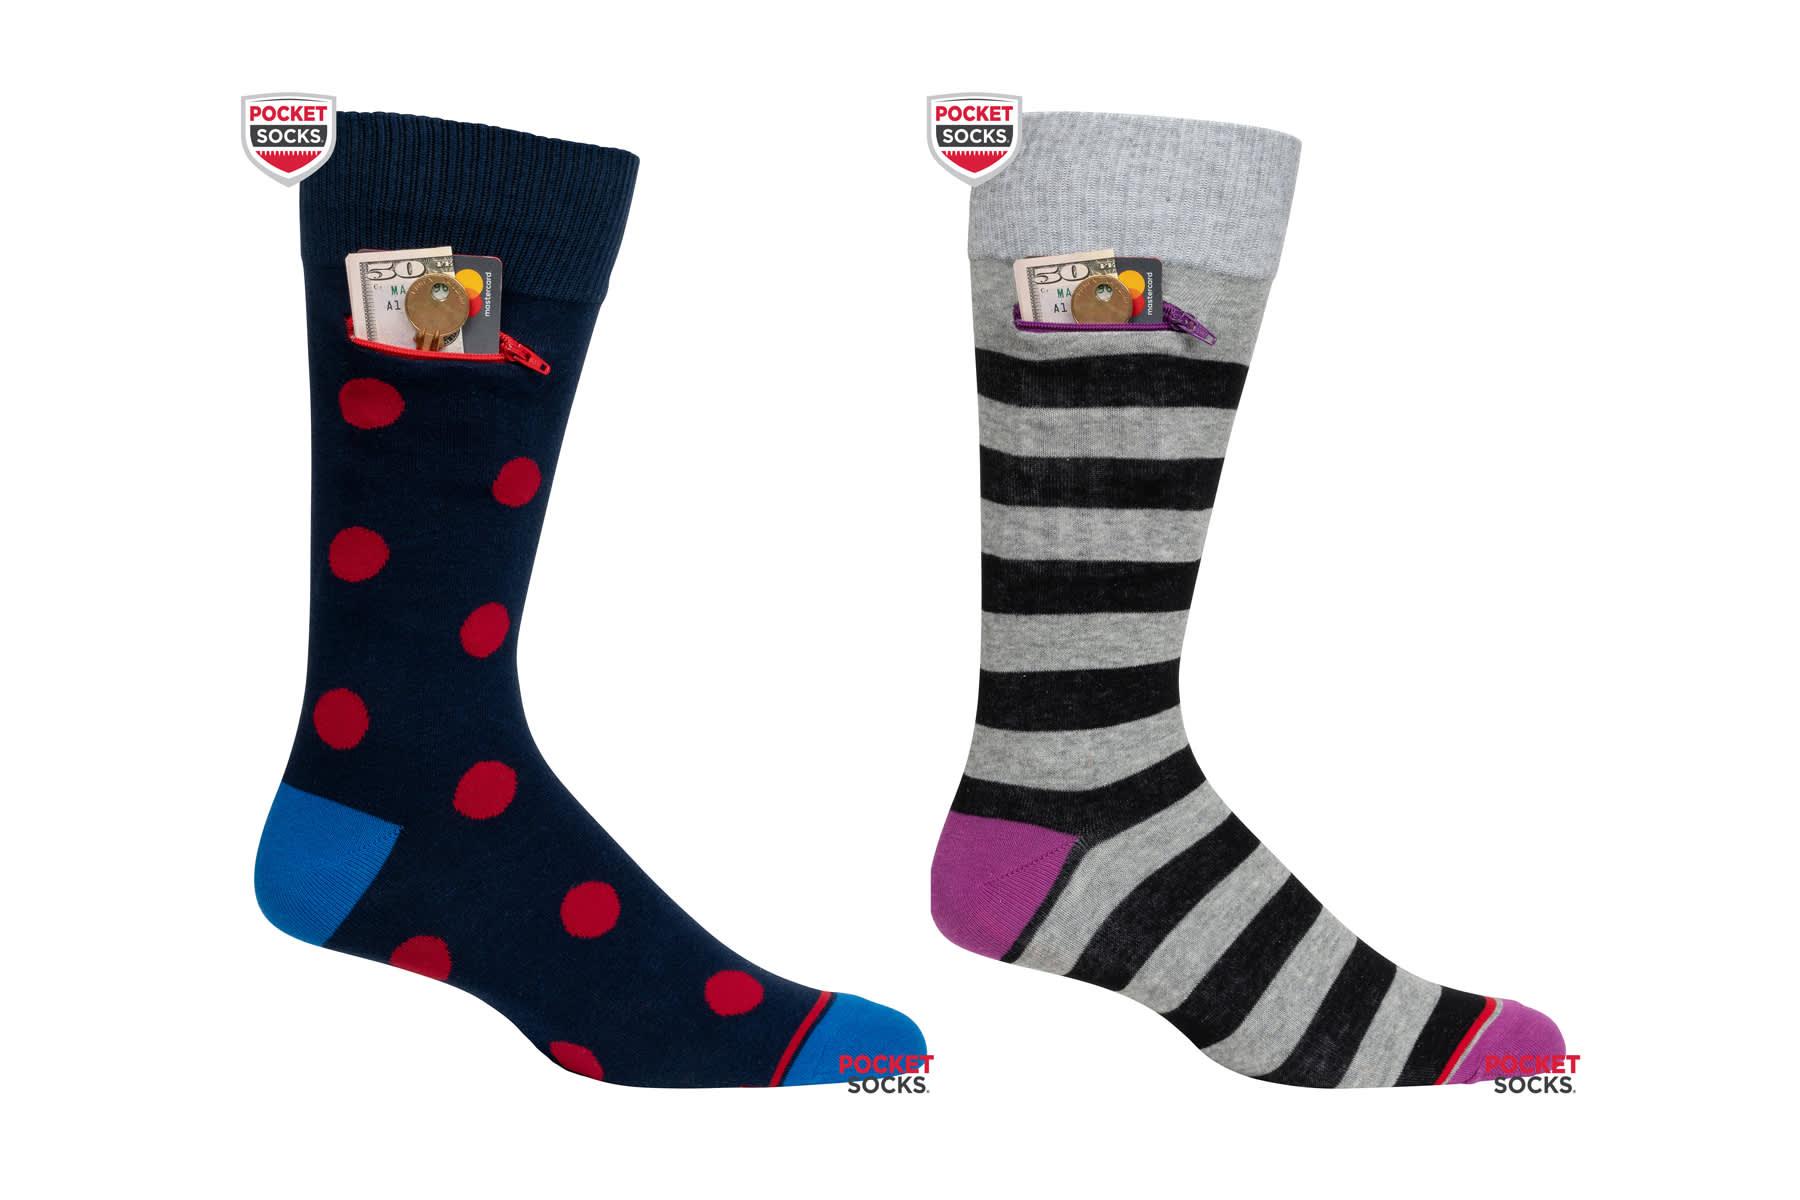 H/O: Travel Goods Show: Pocket Socks